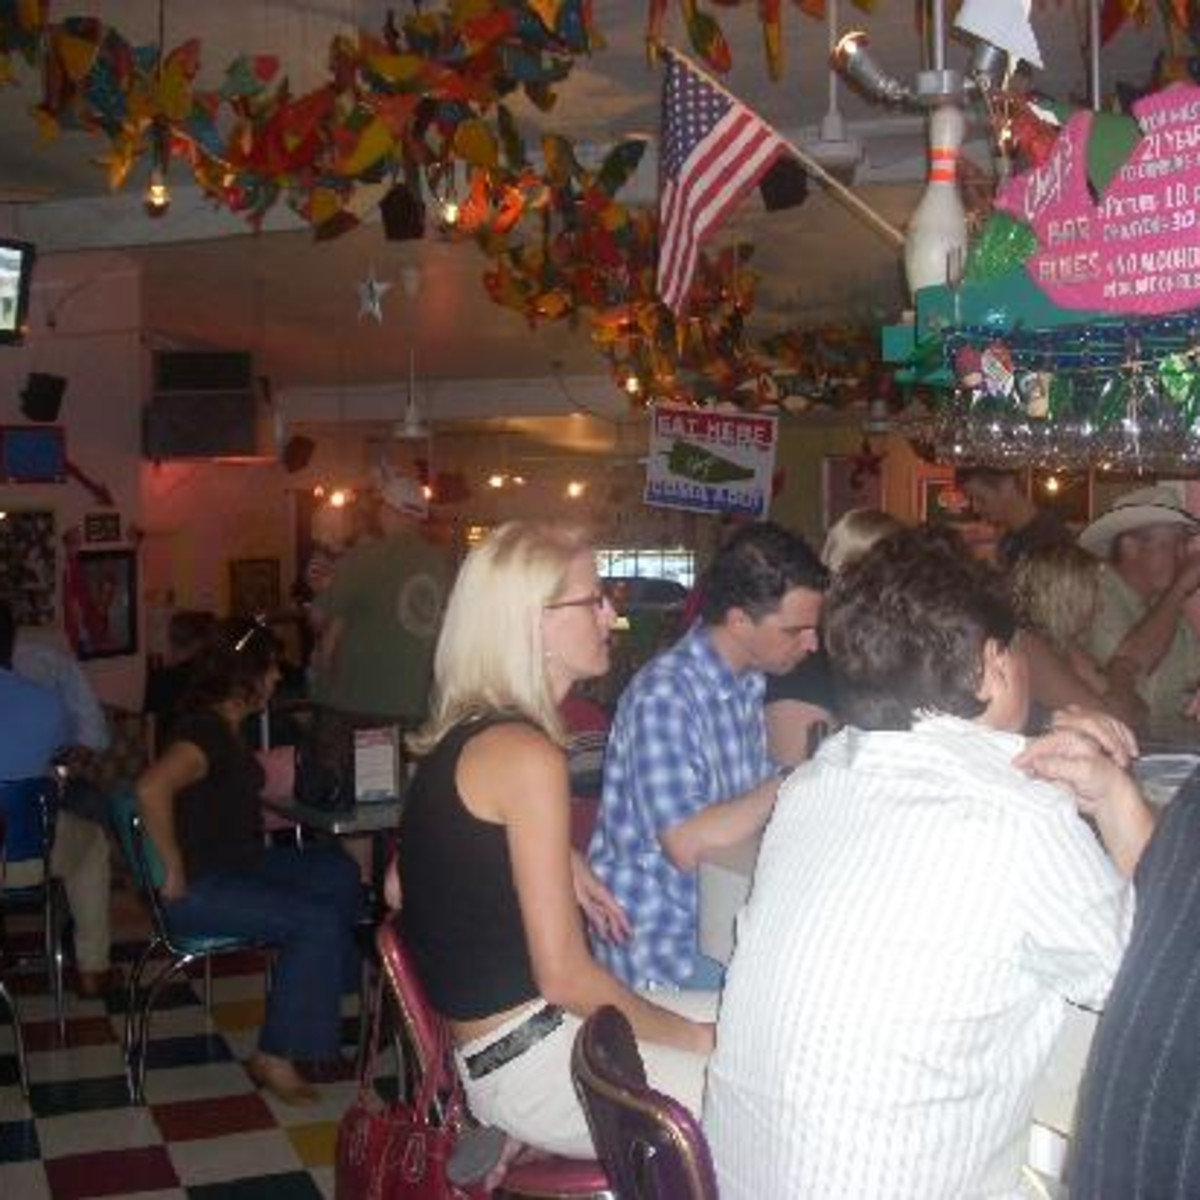 Austin_photo: places_food_chuy's_barton_interior